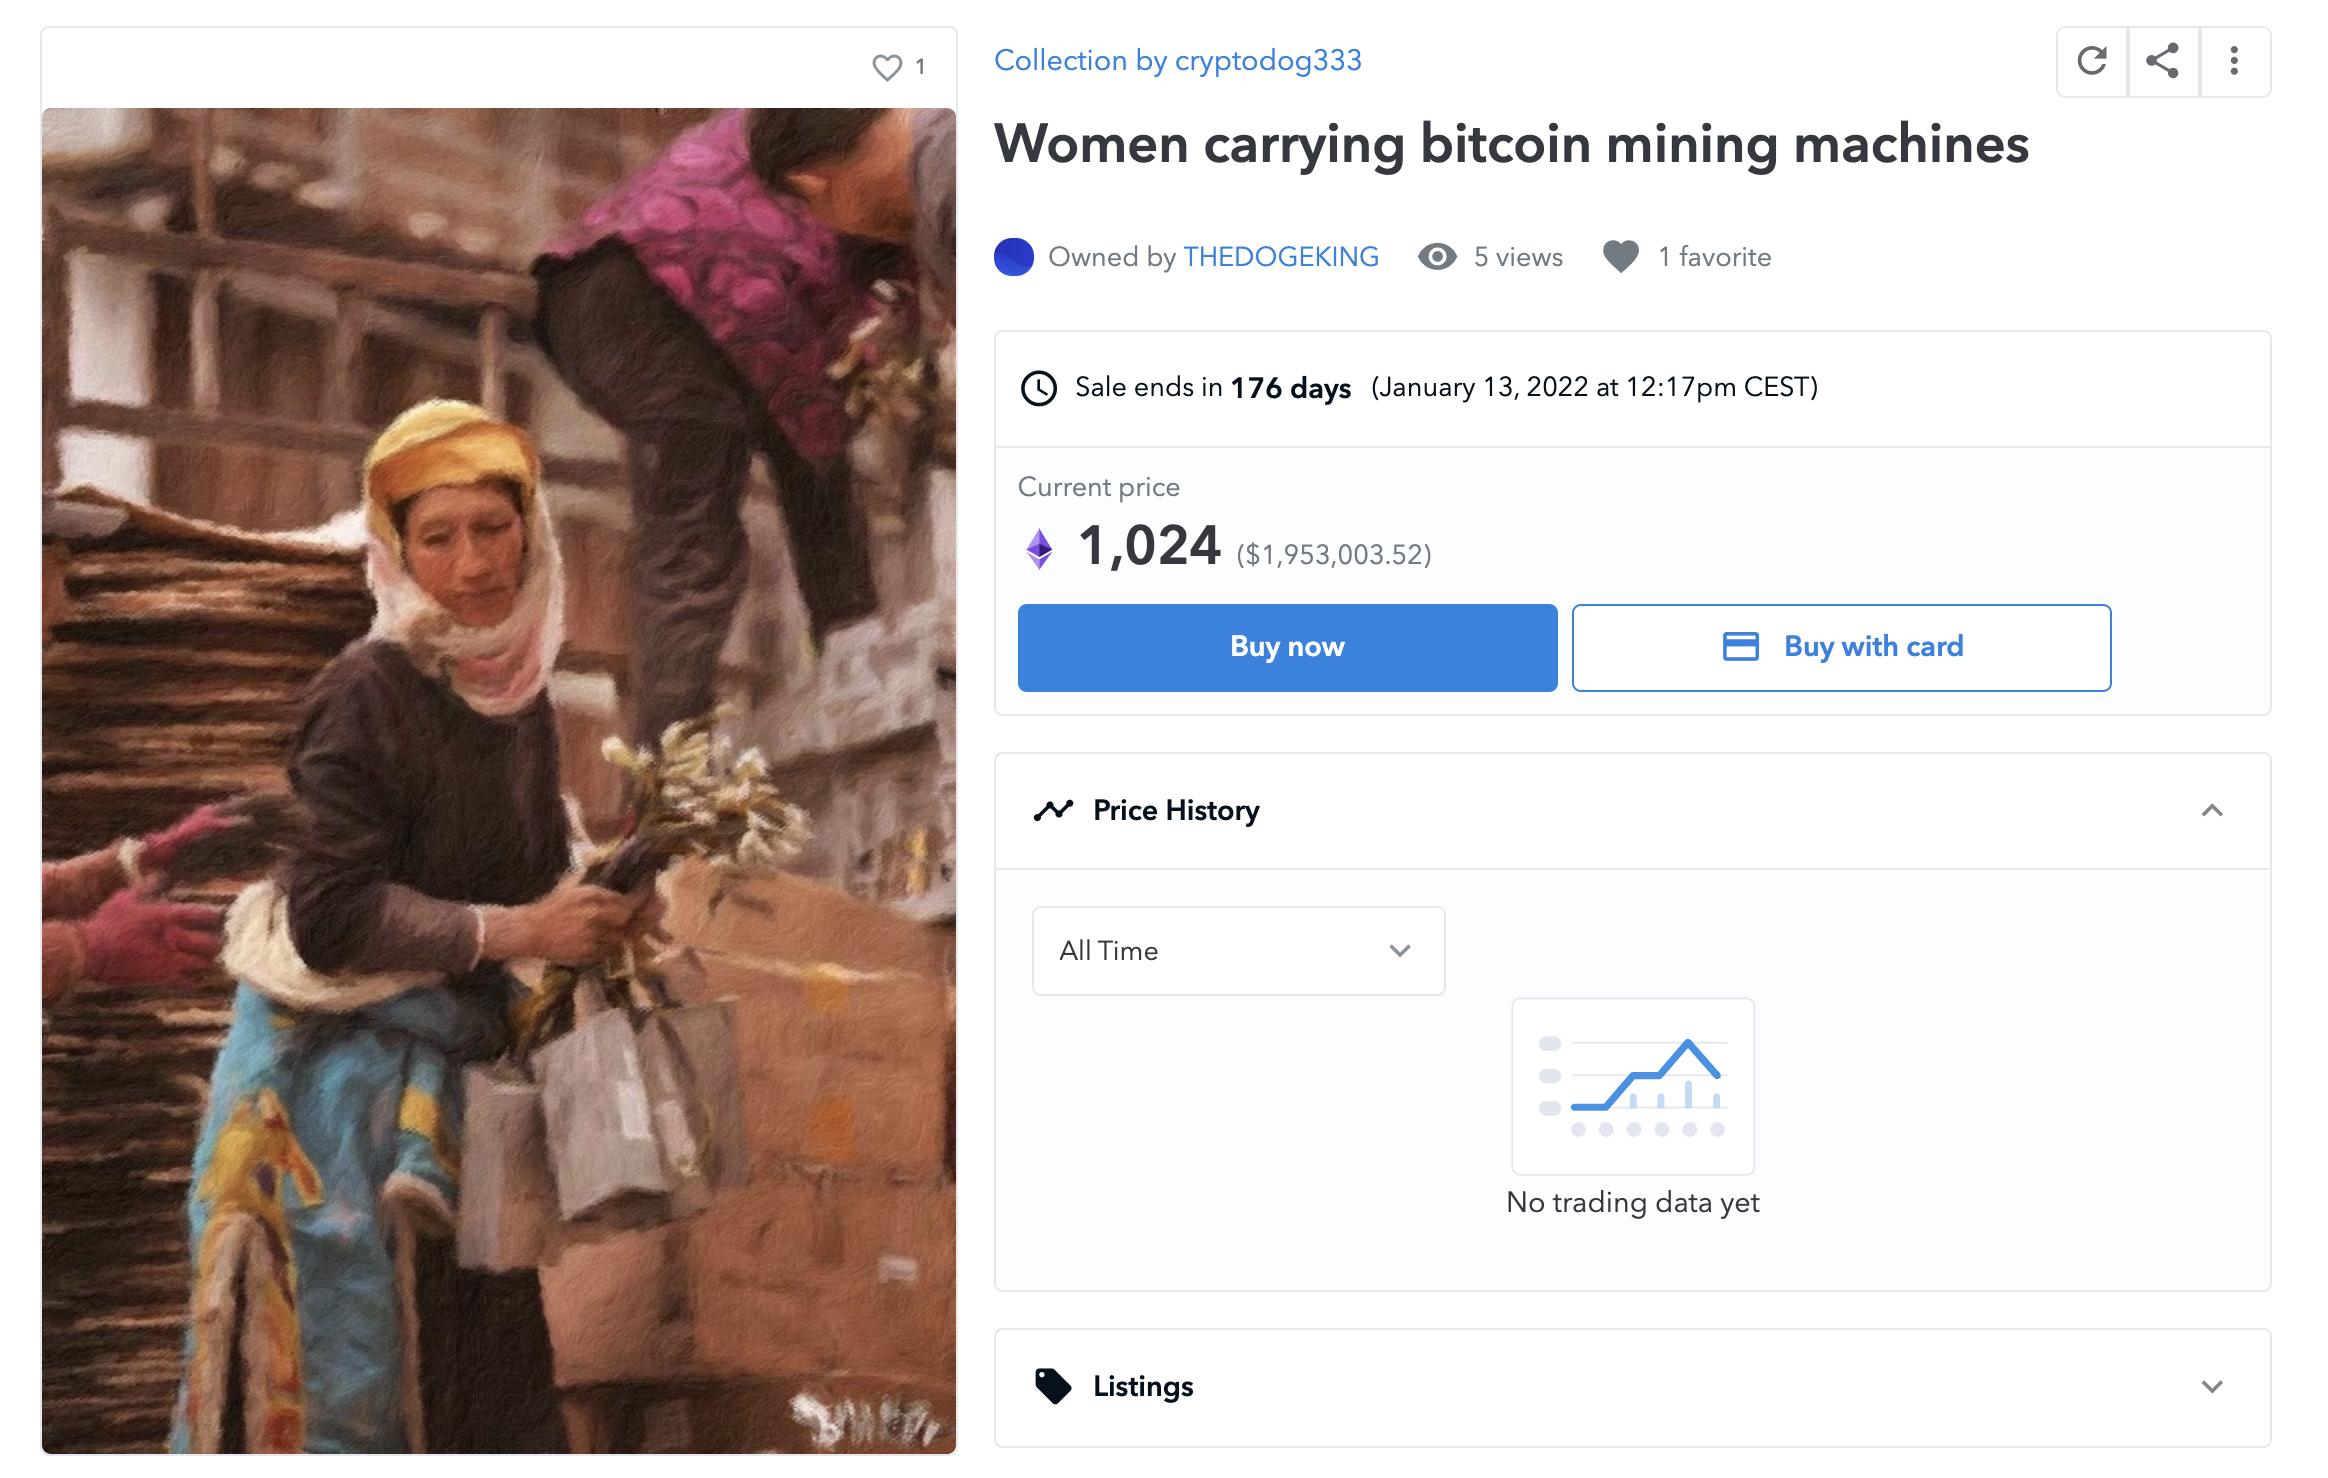 Woman carrying bitcoin mining asics machines NFT, July 2021